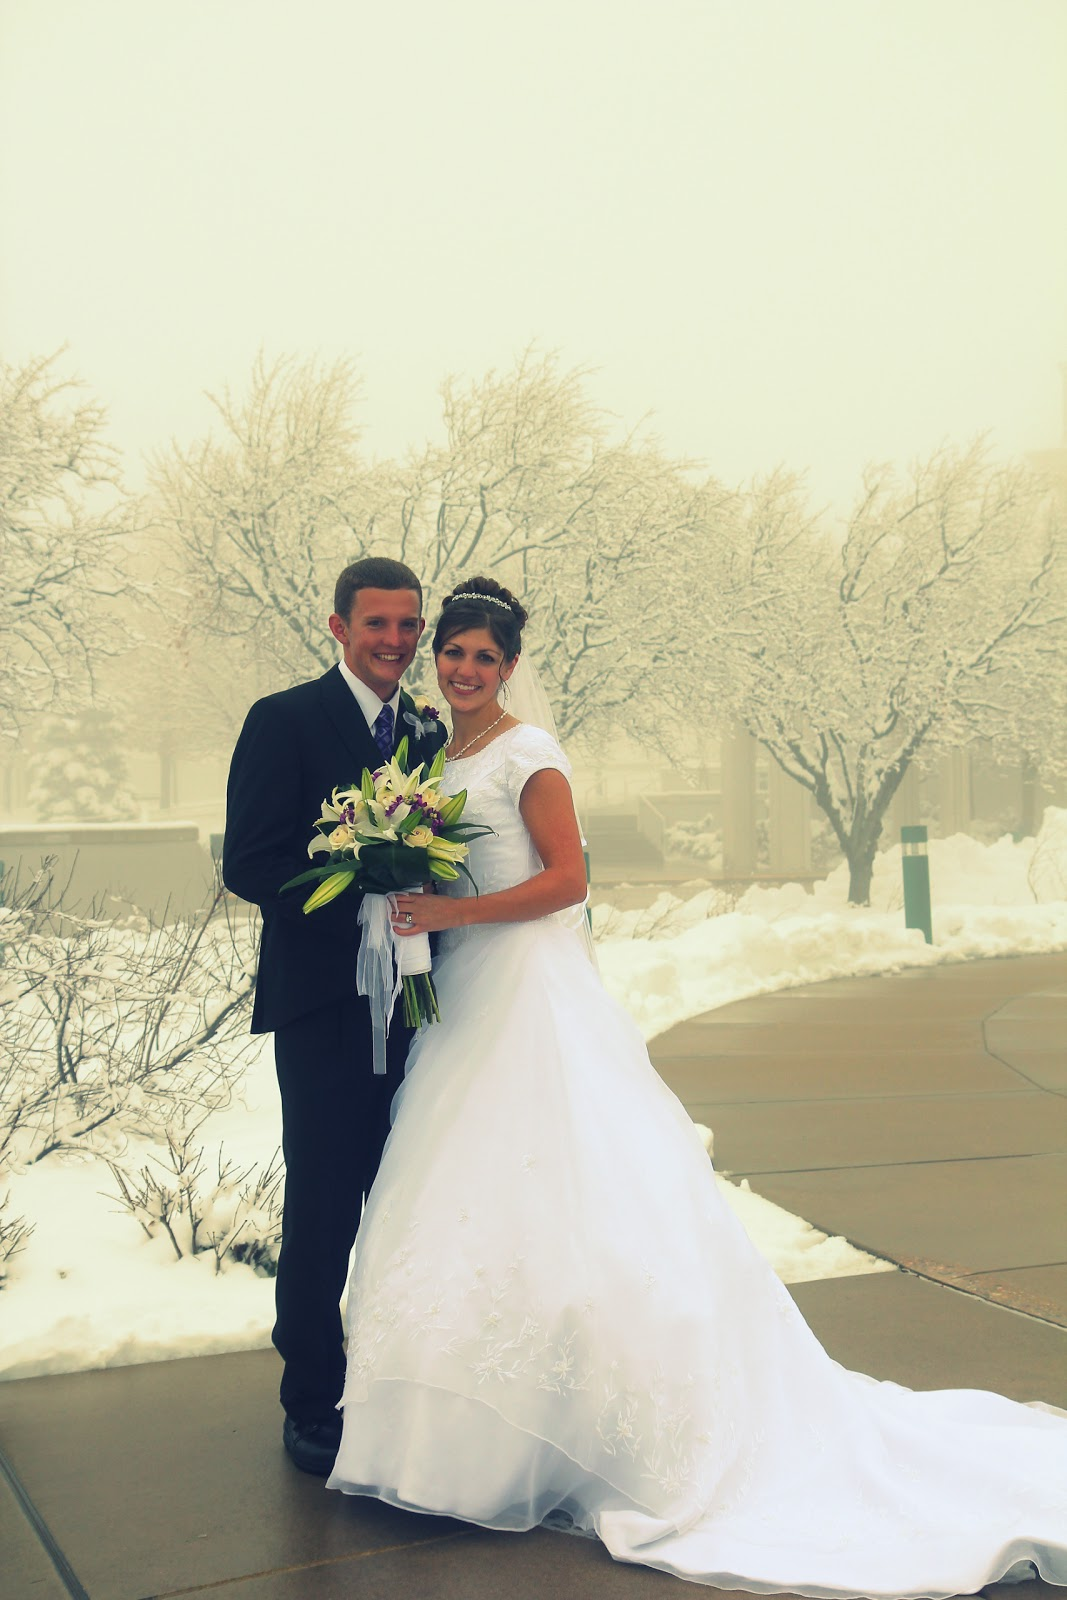 Cheap Wedding Photography Utah: Utah Wedding Photography: Mike & Carly Hales!